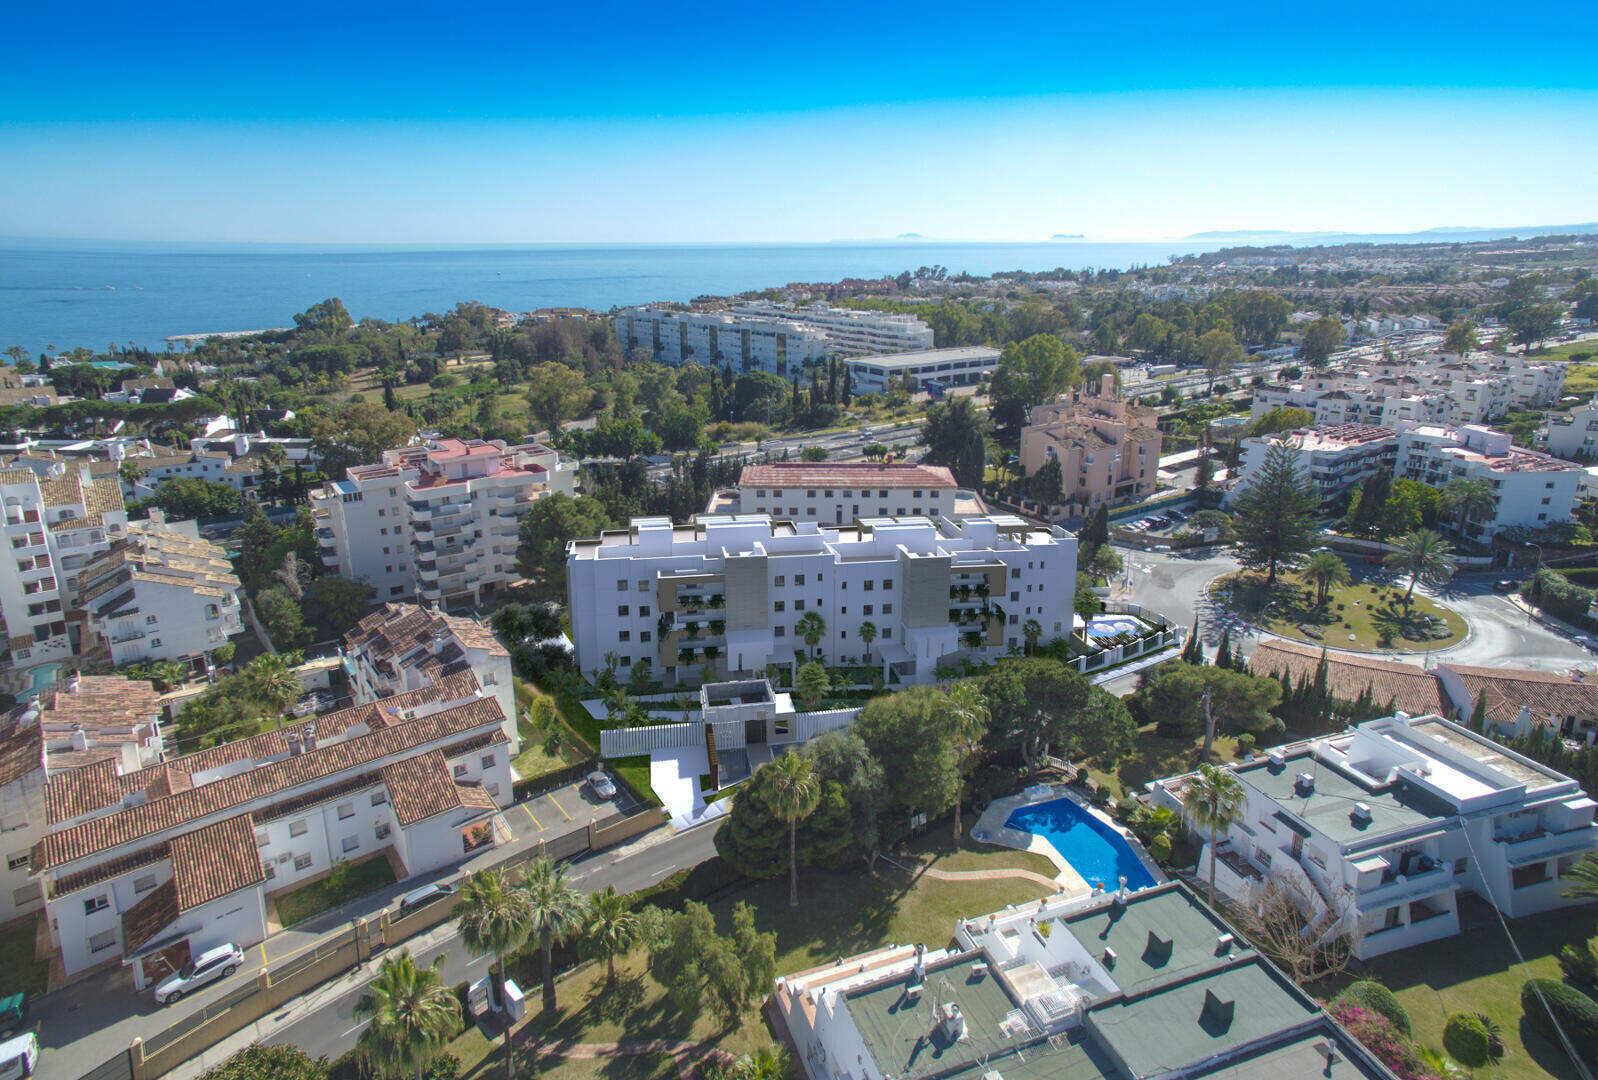 Royal Banus Marbella